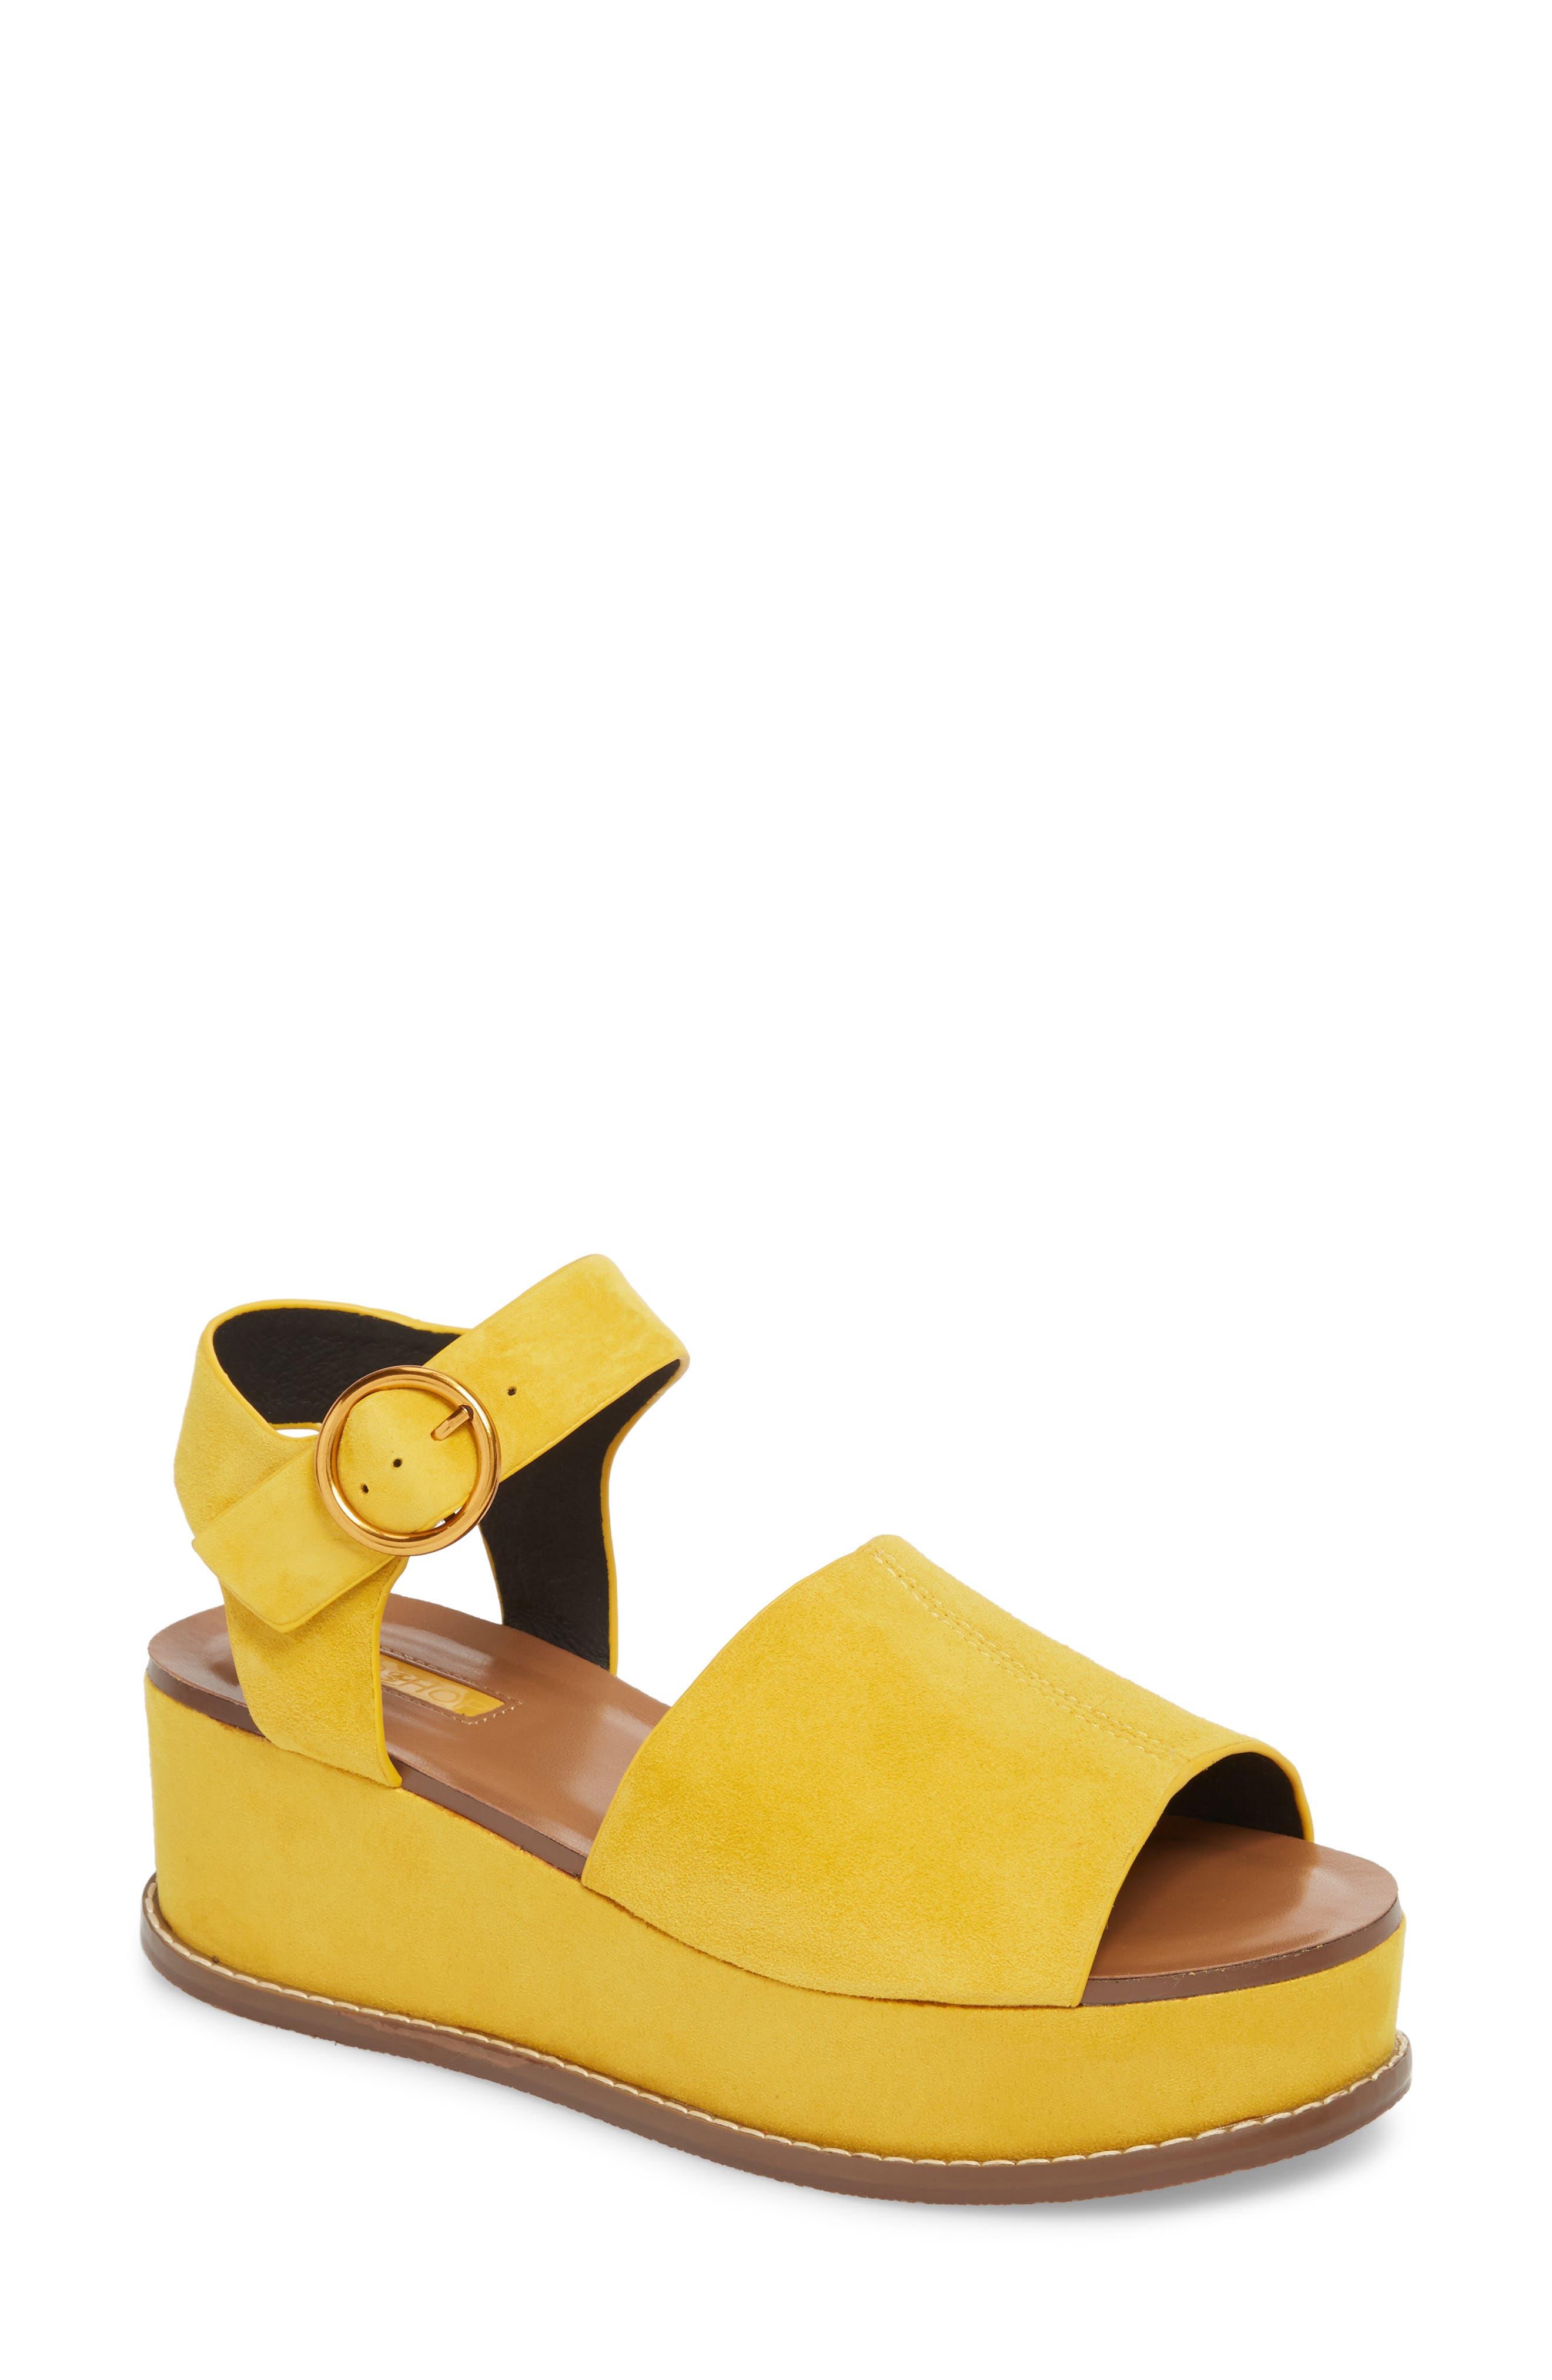 Wow Platform Wedge Sandal,                             Main thumbnail 2, color,